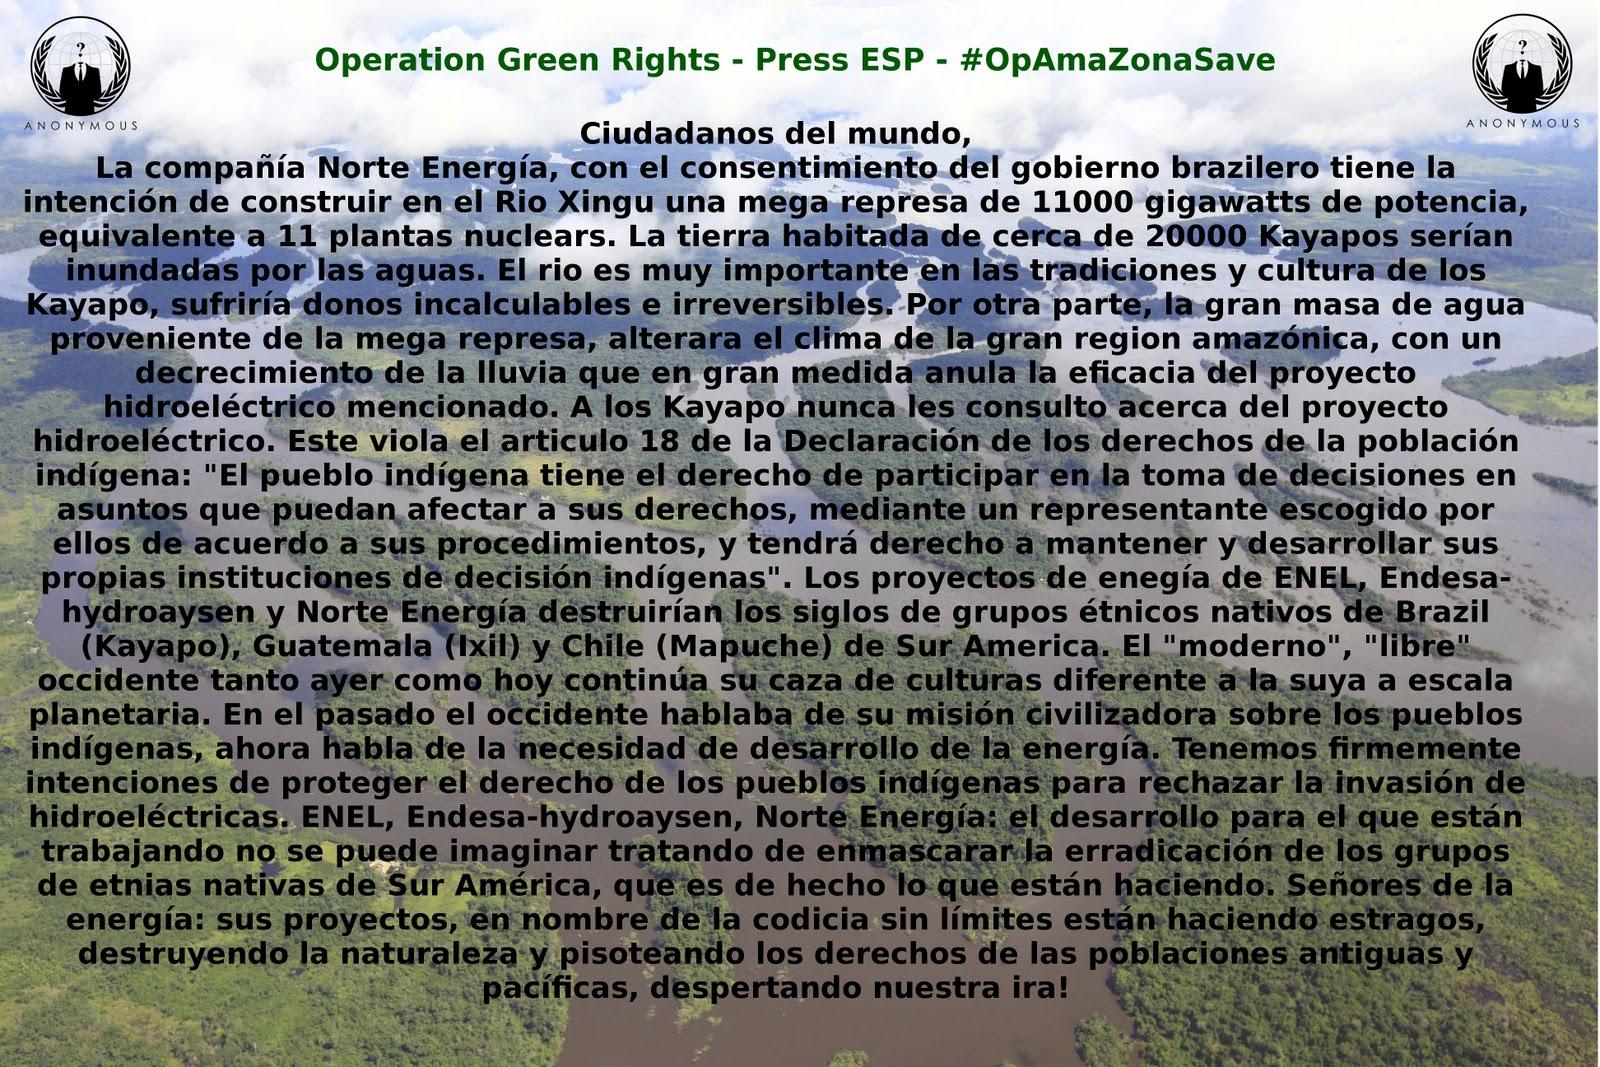 http://4.bp.blogspot.com/-oC9Zk97mmN4/Tvt8oddtmMI/AAAAAAAAAKE/18sz4t7UsrQ/s1600/AmaZonaSave_PressESPpng.jpg